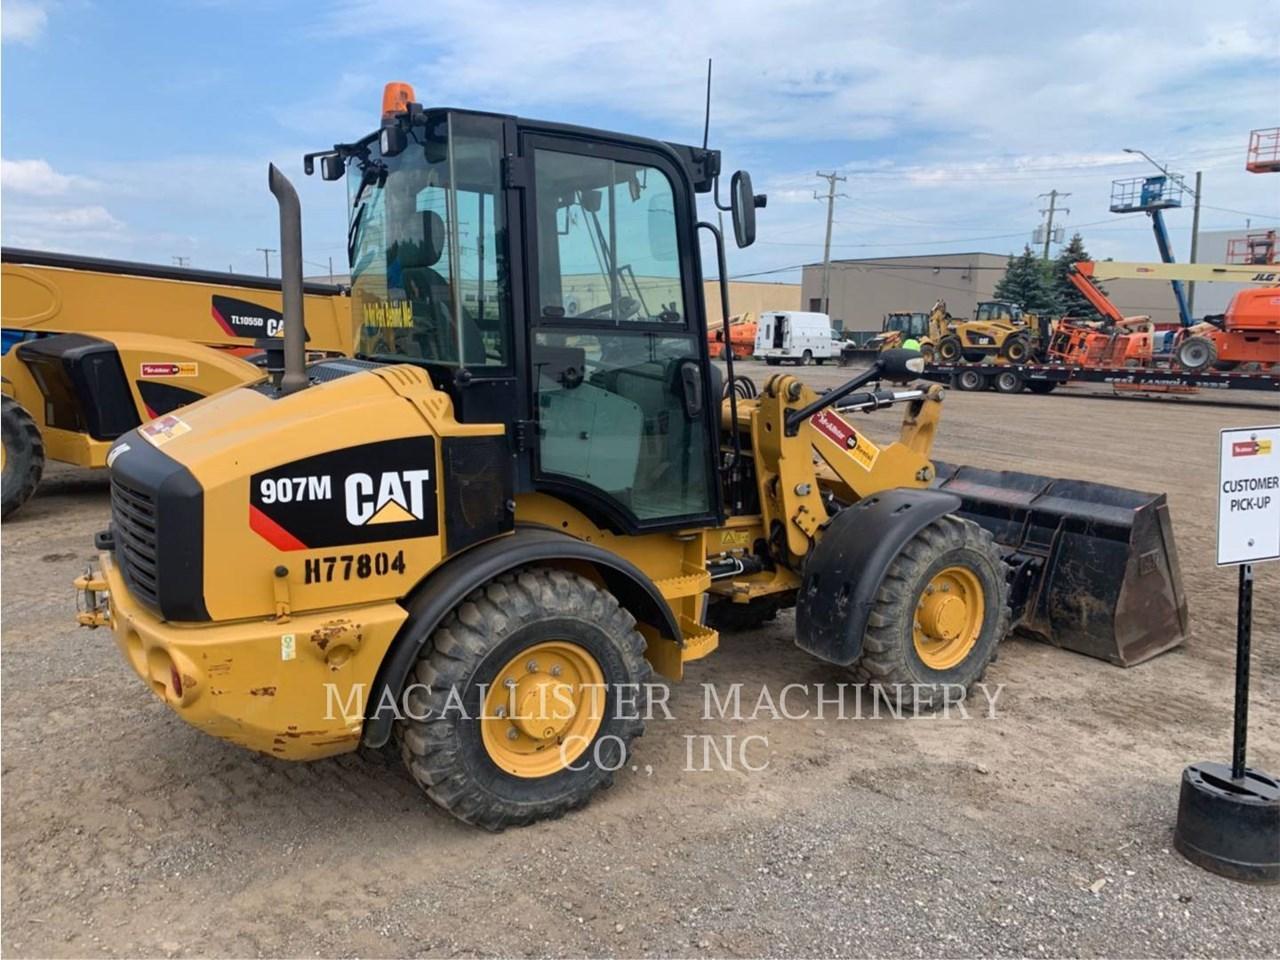 2016 Caterpillar 907M Image 3